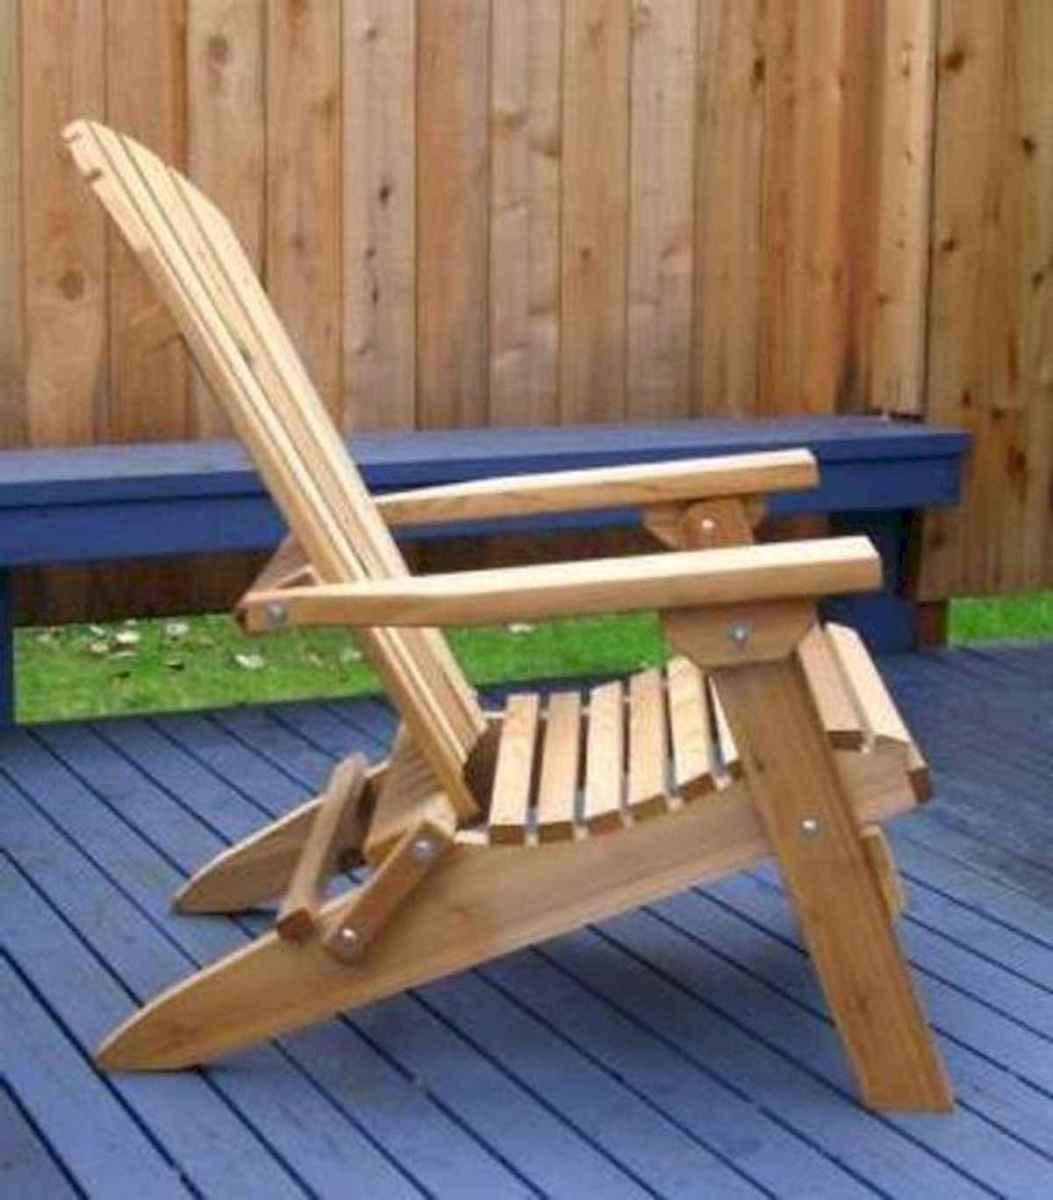 60 Amazing DIY Projects Otdoors Furniture Design Ideas (53)